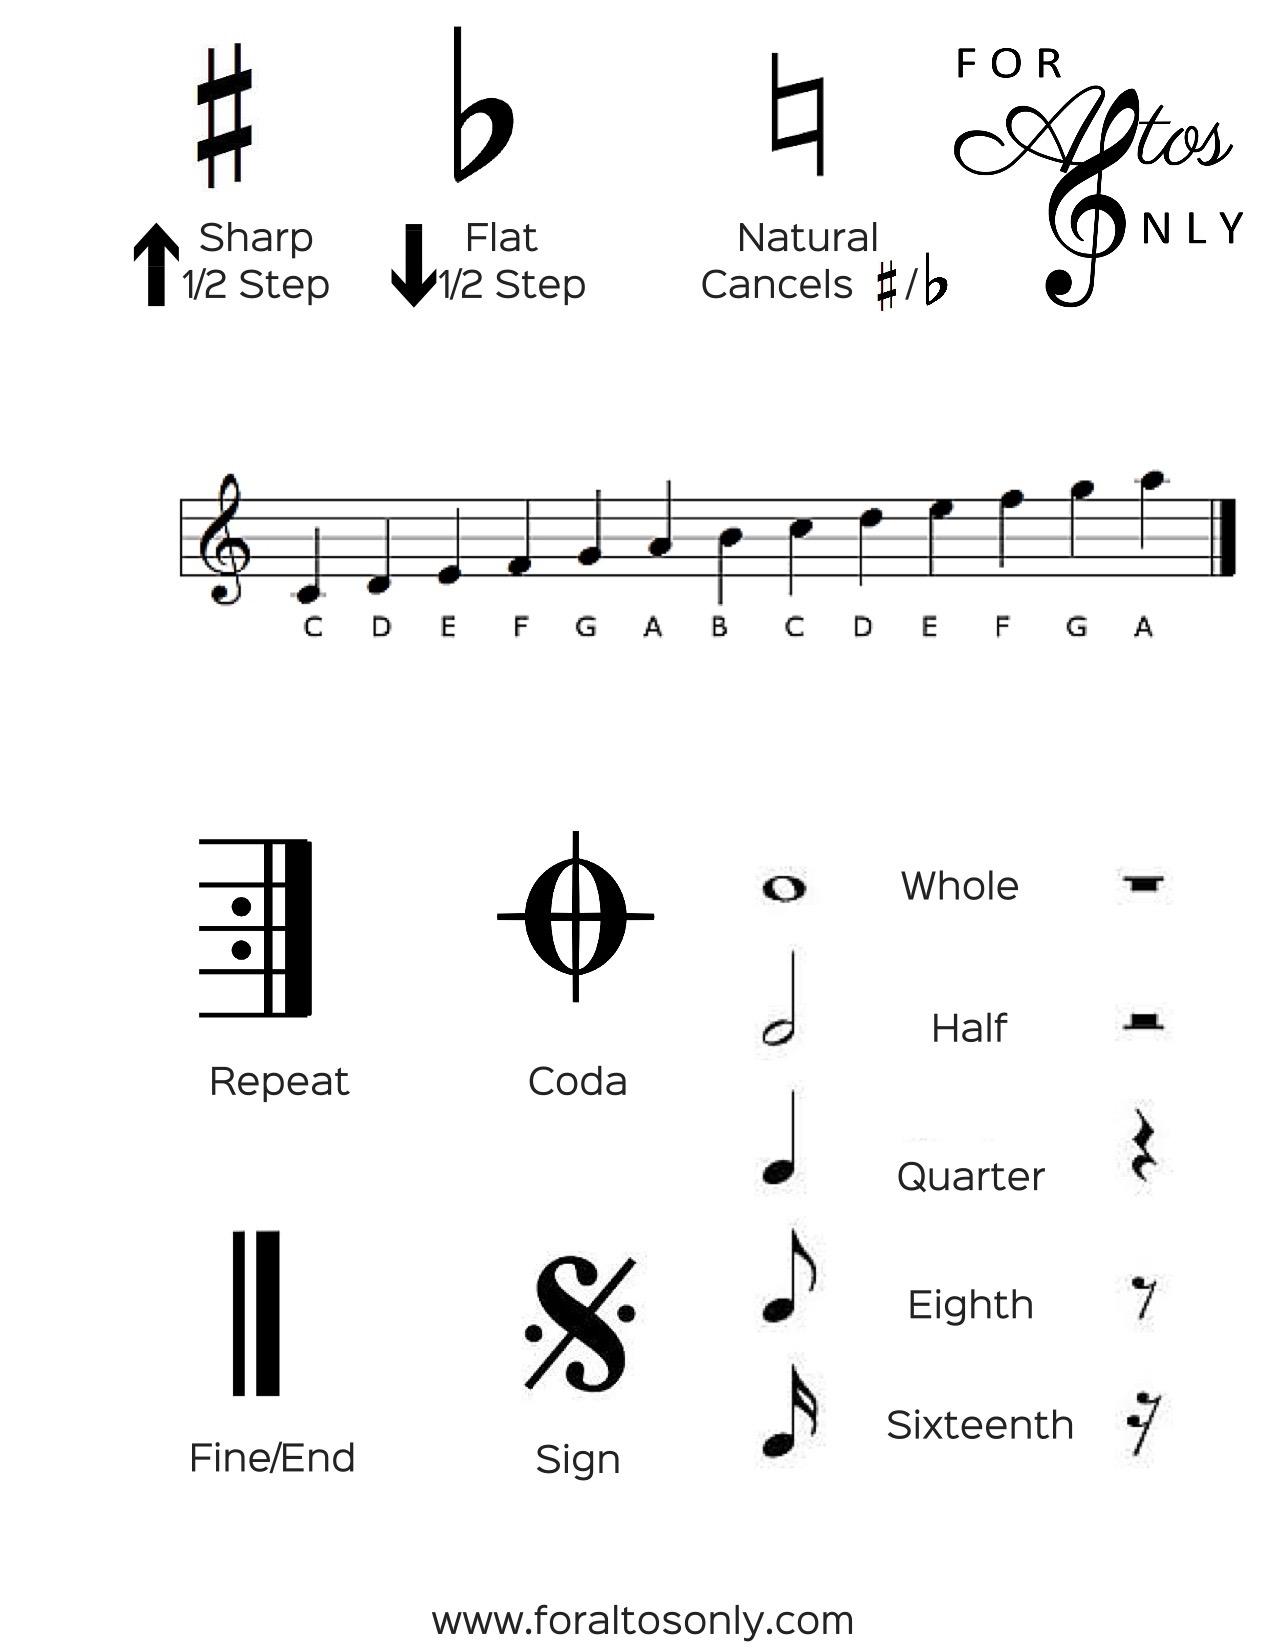 Music Reference Sheet